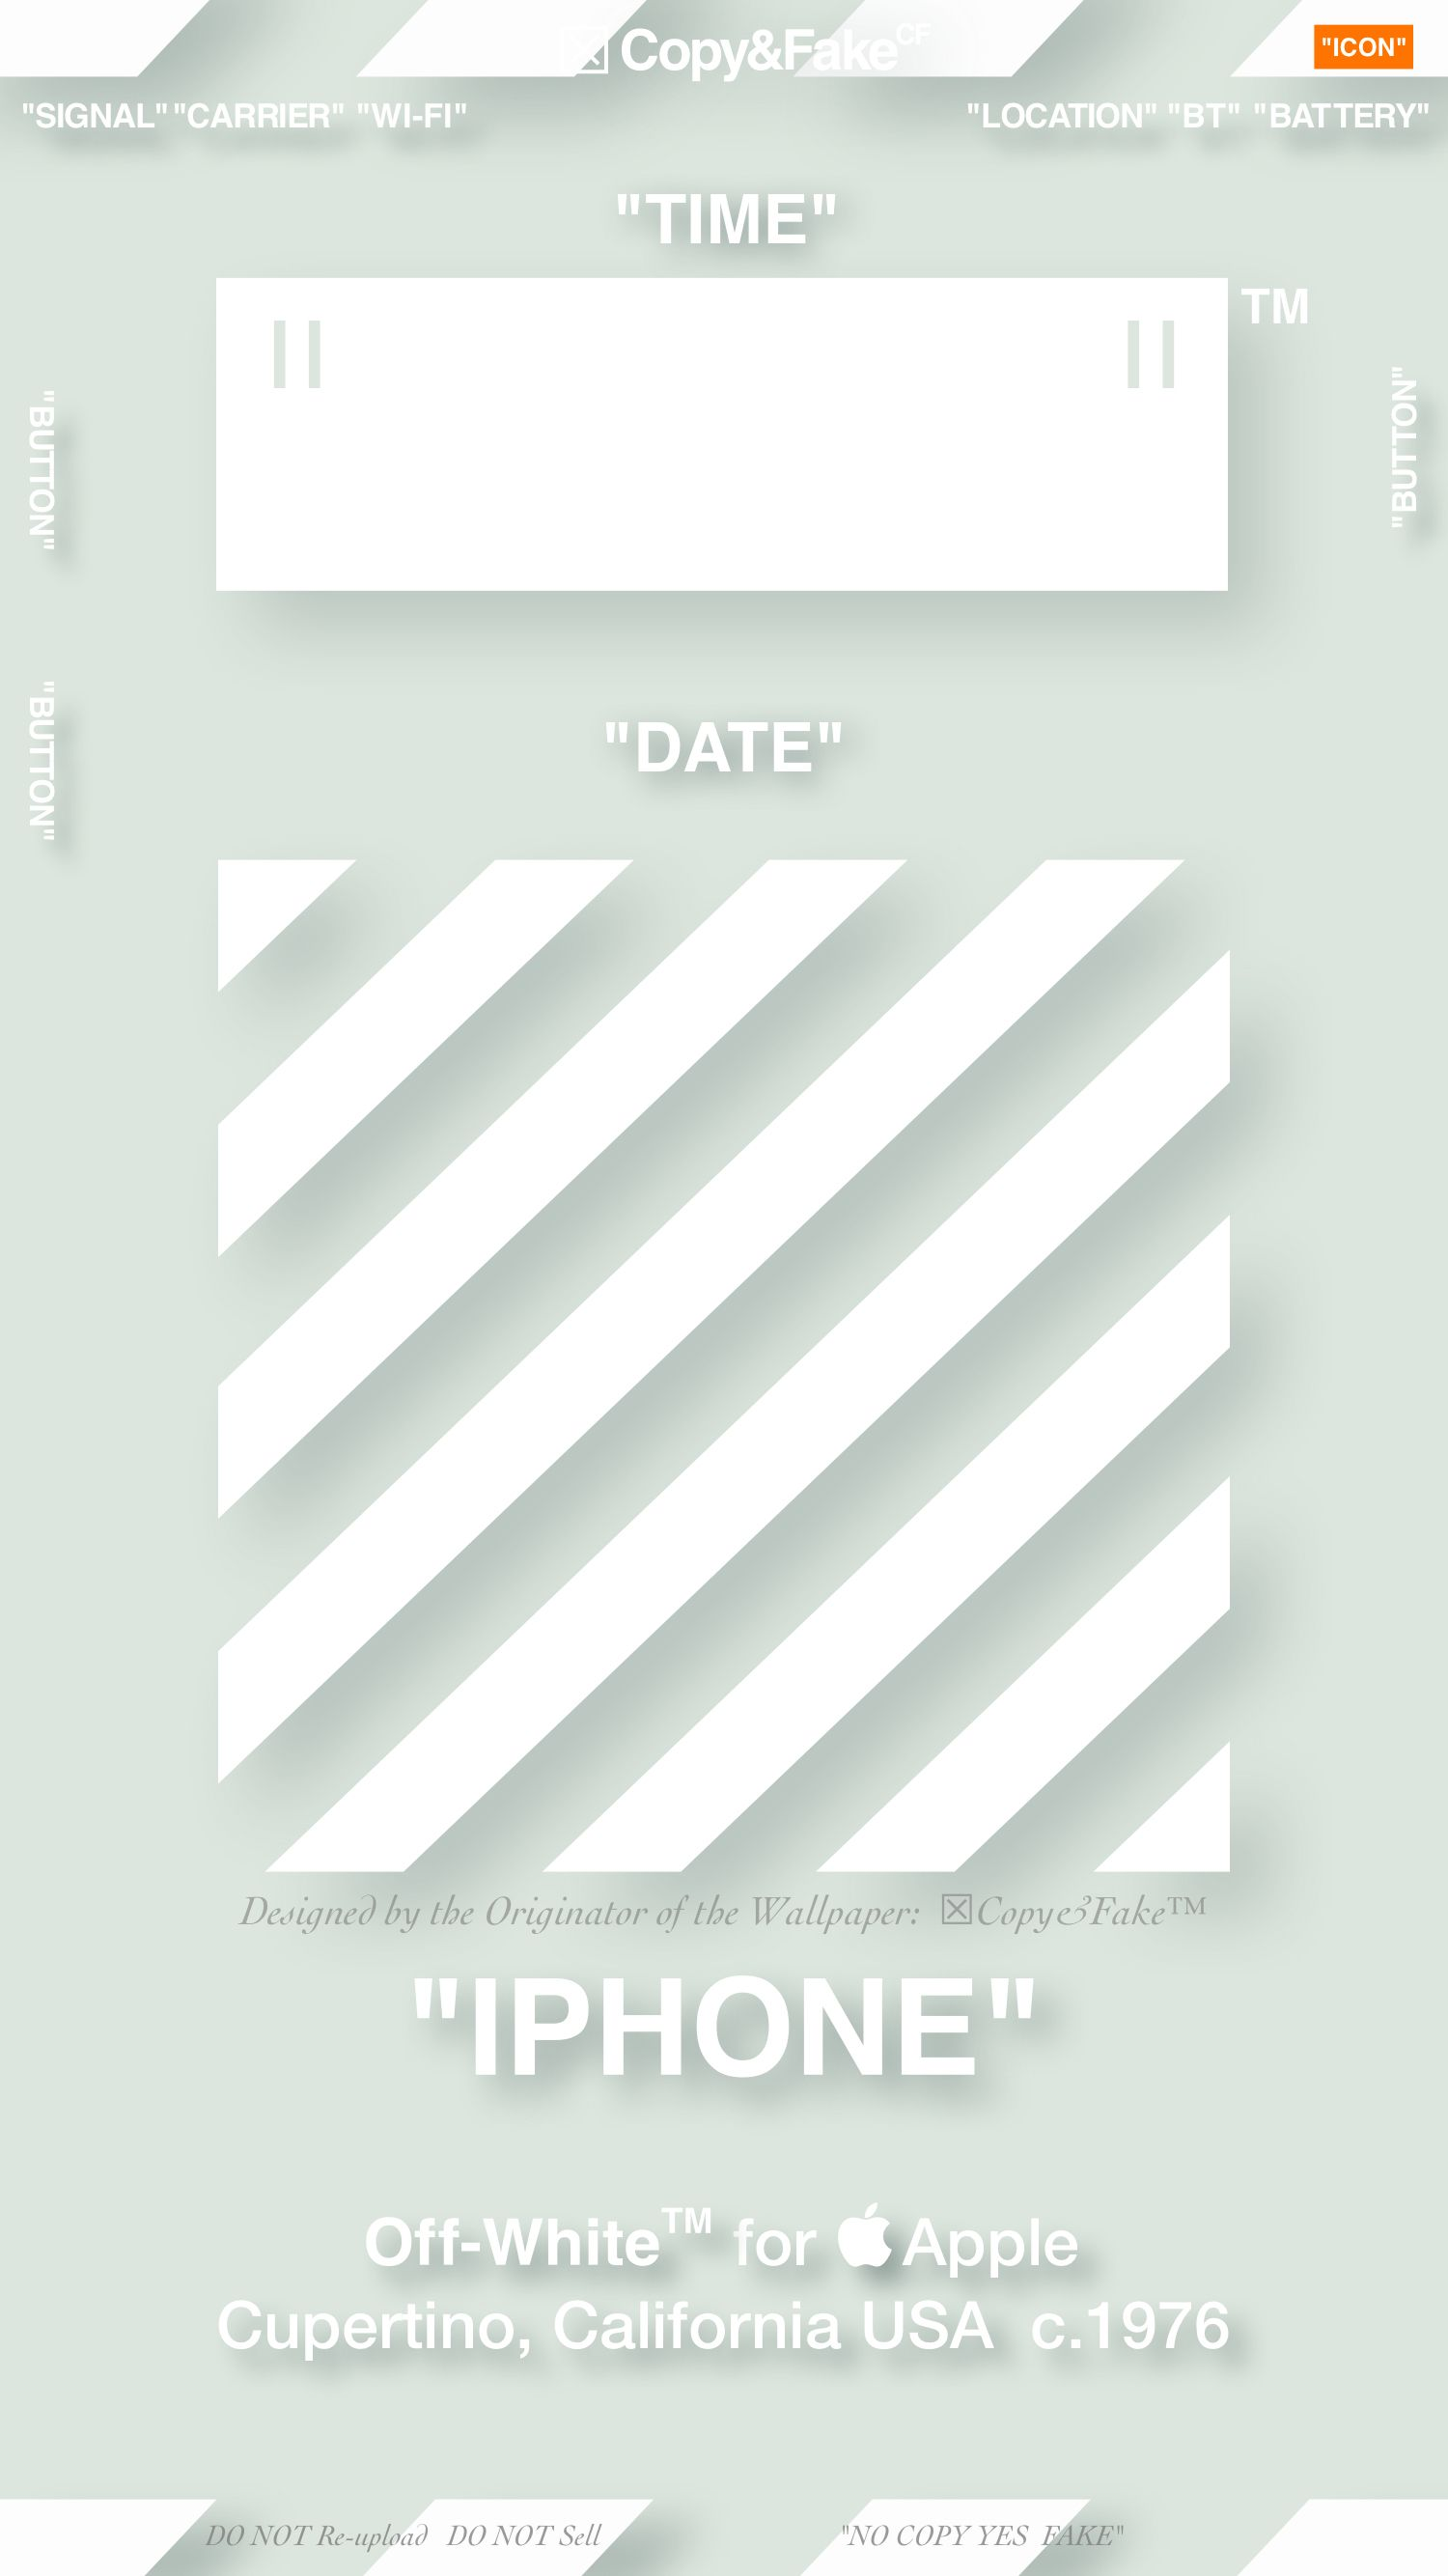 2019 5 6 Copy Fake Wallpaper 壁紙 Offwhitewallpaper オフ